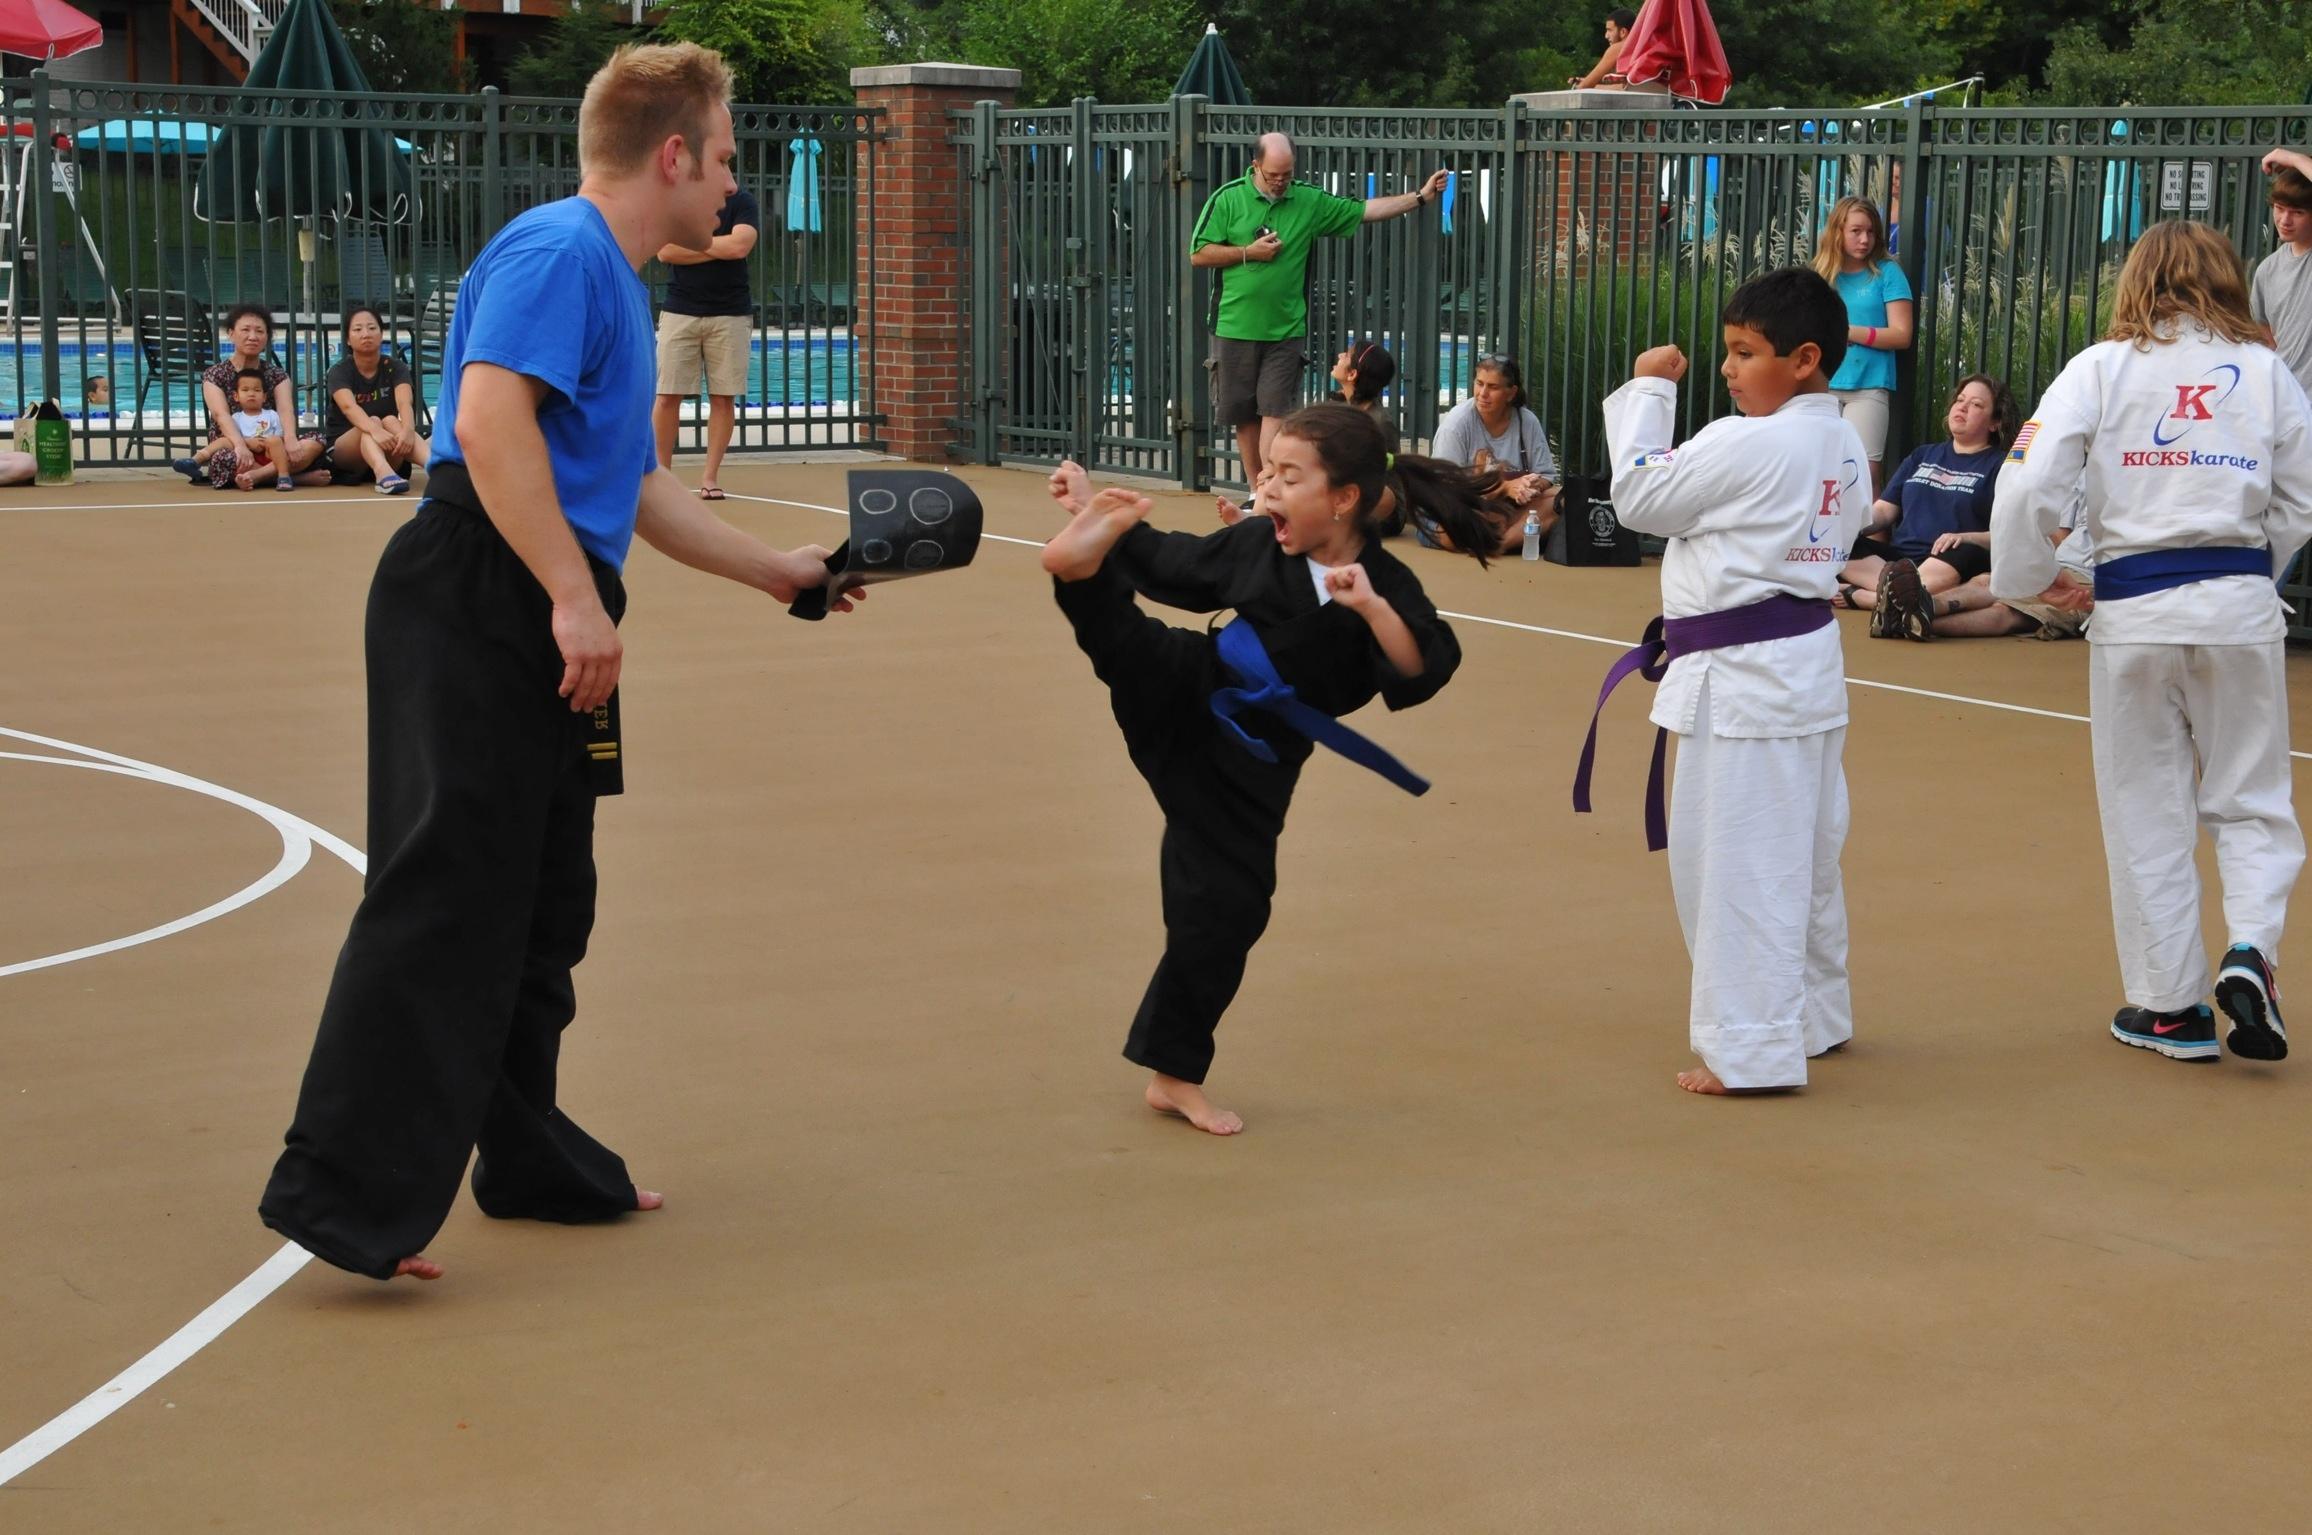 National Night Out Sign at Kicks Karate | Montgomery